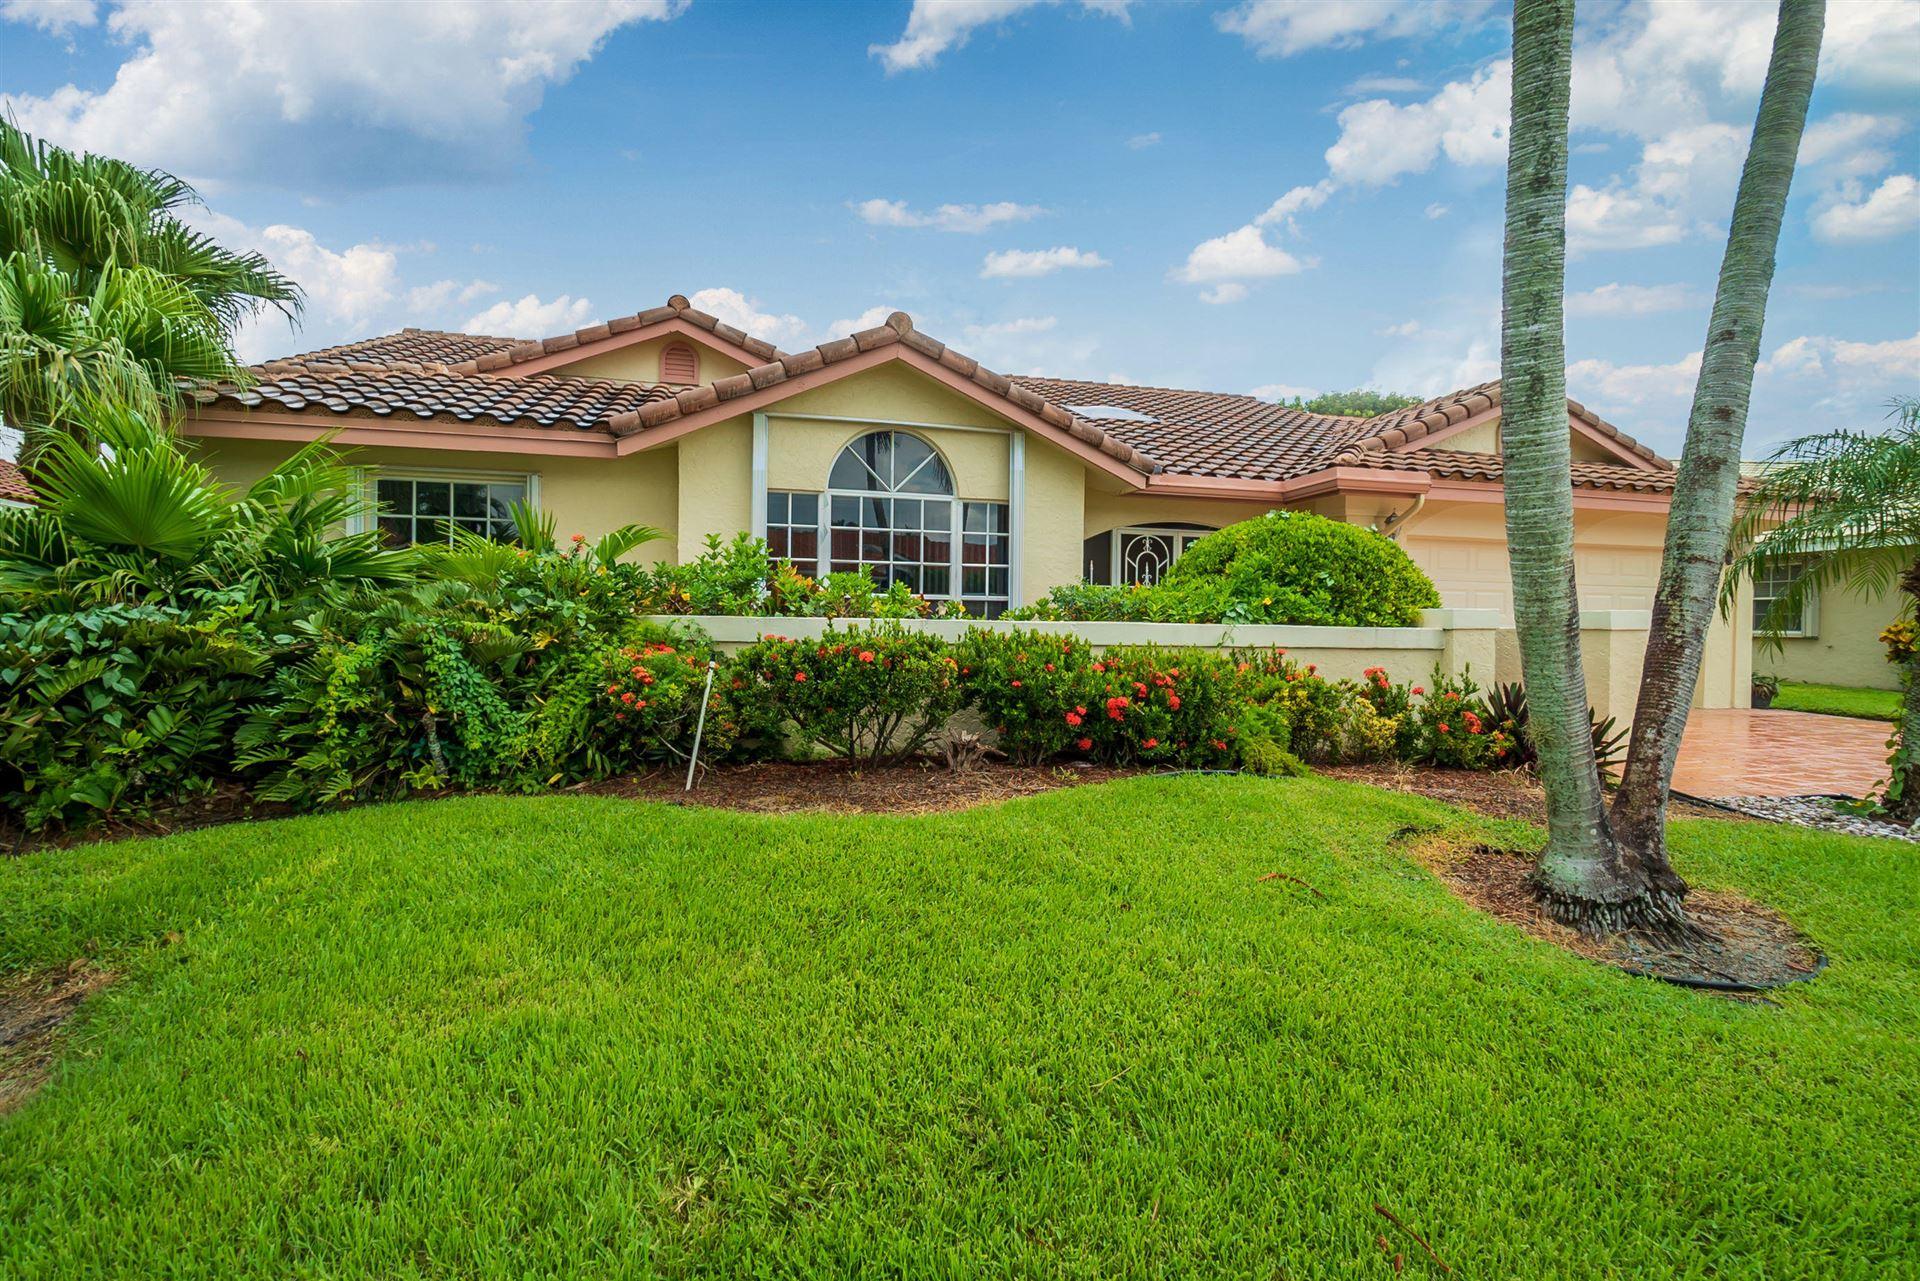 6186 Golf Villas Drive, Boynton Beach, FL 33437 - #: RX-10659789